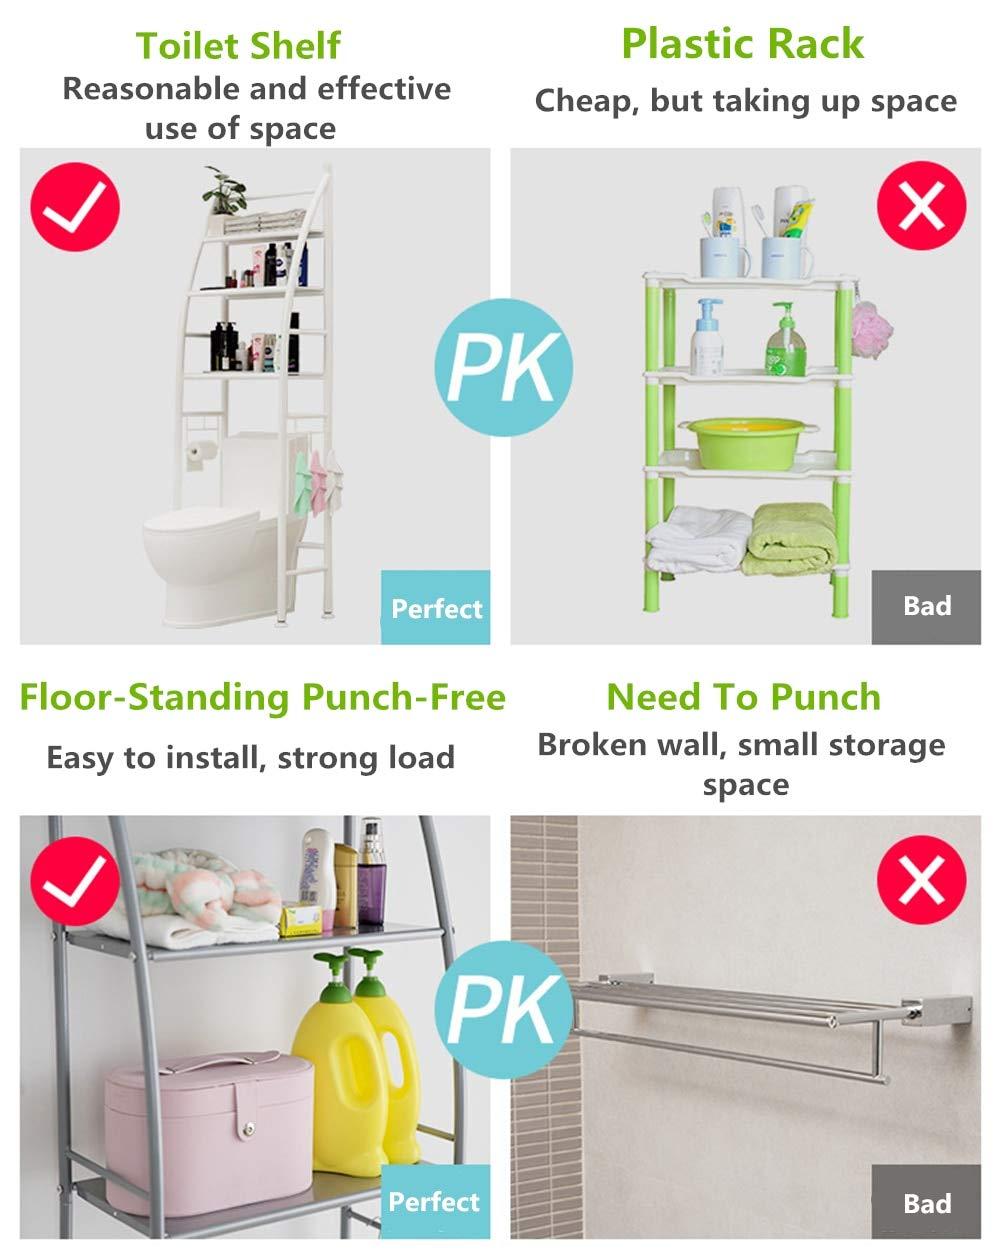 Bathroom Shelf Over Toilet Roll Holder and Towel Hook,Kitchen Holder,3 Washingmachine Shelf